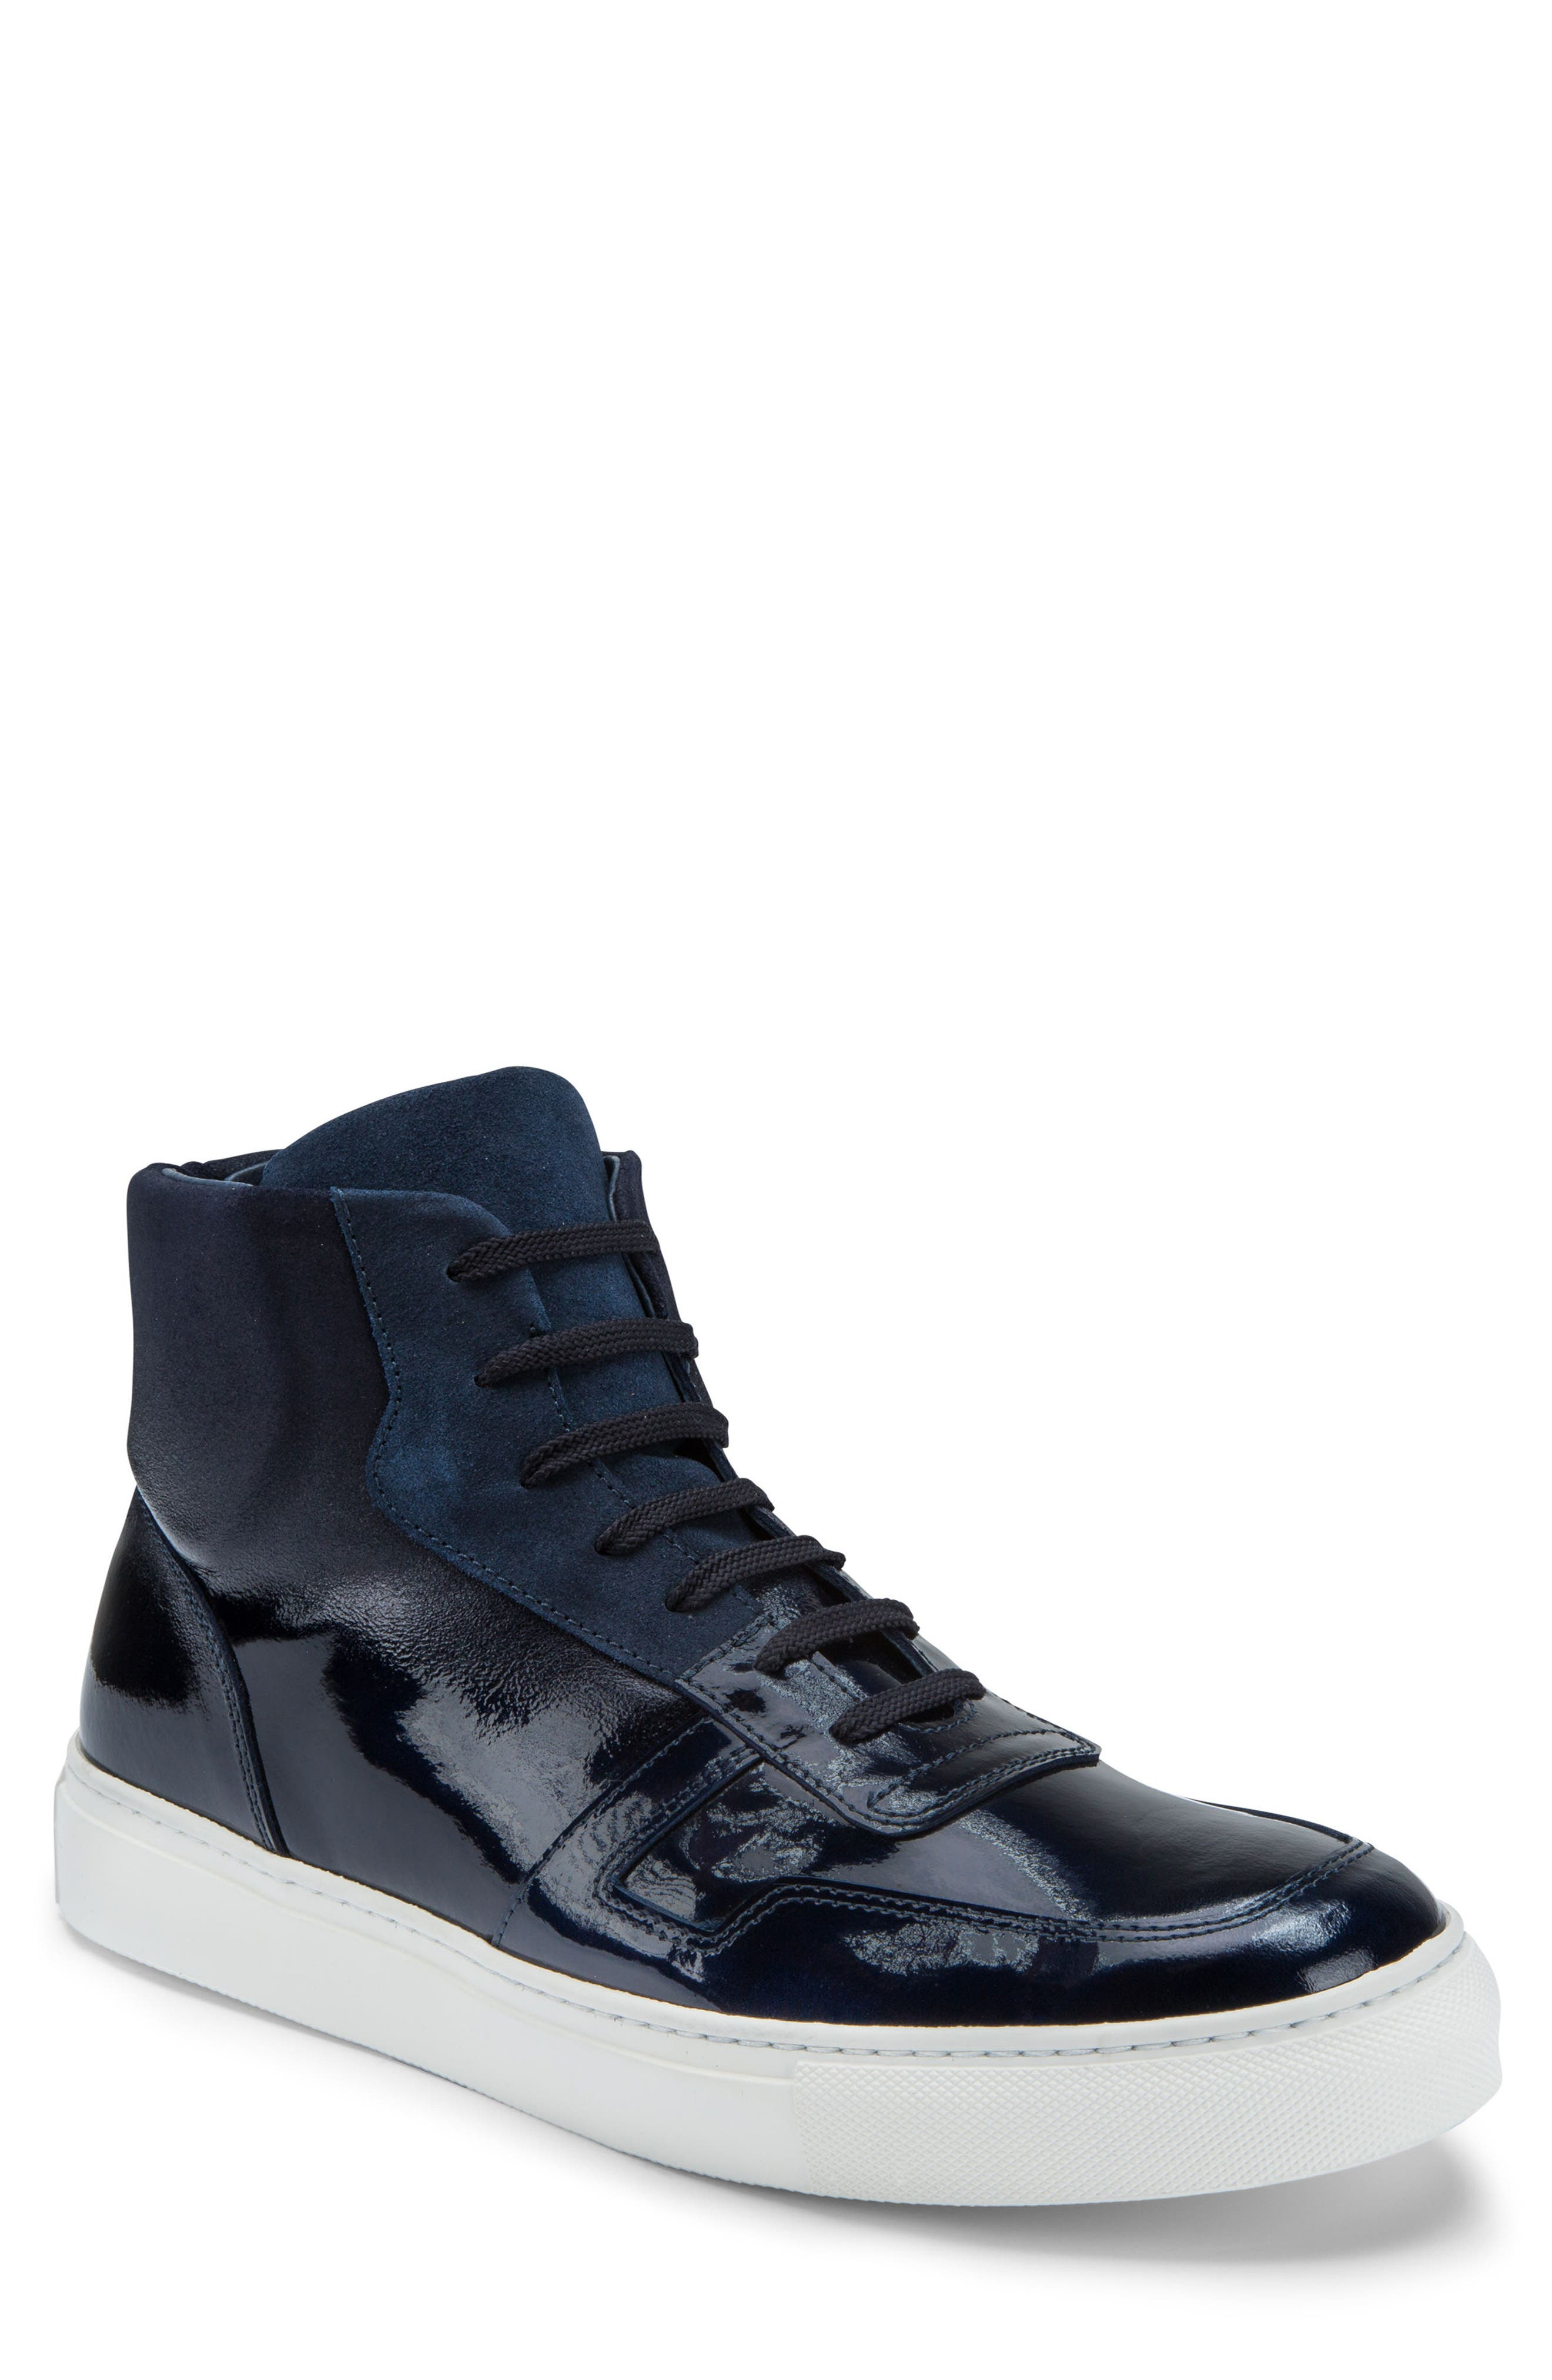 Pistoia Sneaker,                             Main thumbnail 1, color,                             429